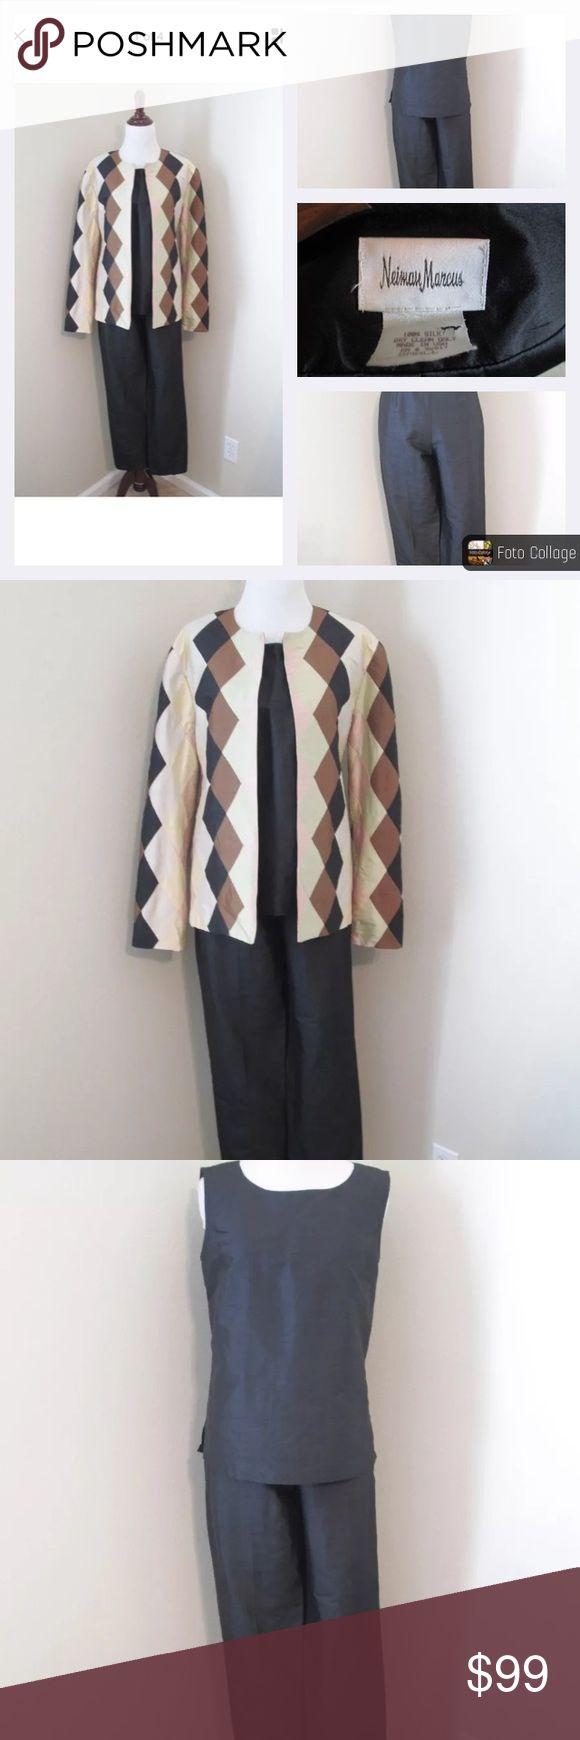 "NEIMAN MARCUS Black Silk Pant Shell Jacket Suit S Gorgeous NEIMAN MARCUS 3Pc Pant Suit in MINT CONDITION  100% SILK  Sz S  Jacket:  Bust 38"" / Length 25""  Shell:  Bust 36"" /Length 22""  Pant:  Waist 24-28""/Rise 12.5""/Inseam 28"" Neiman Marcus Other"